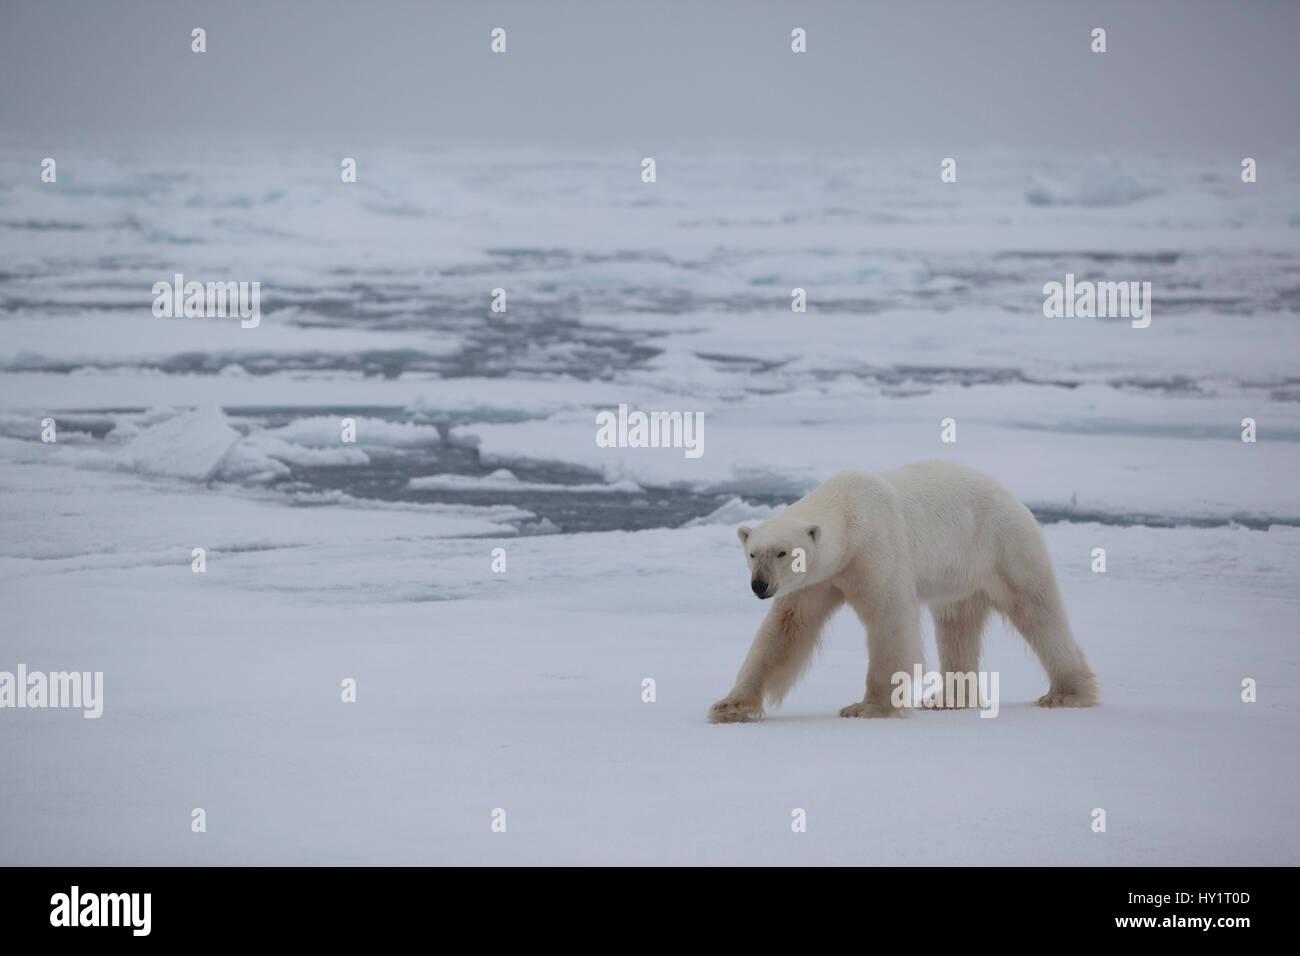 RF- Polar bear (Ursus maritimus) on ice floe, Svalbard, Norway, September 2009. Endangered species. Stock Photo